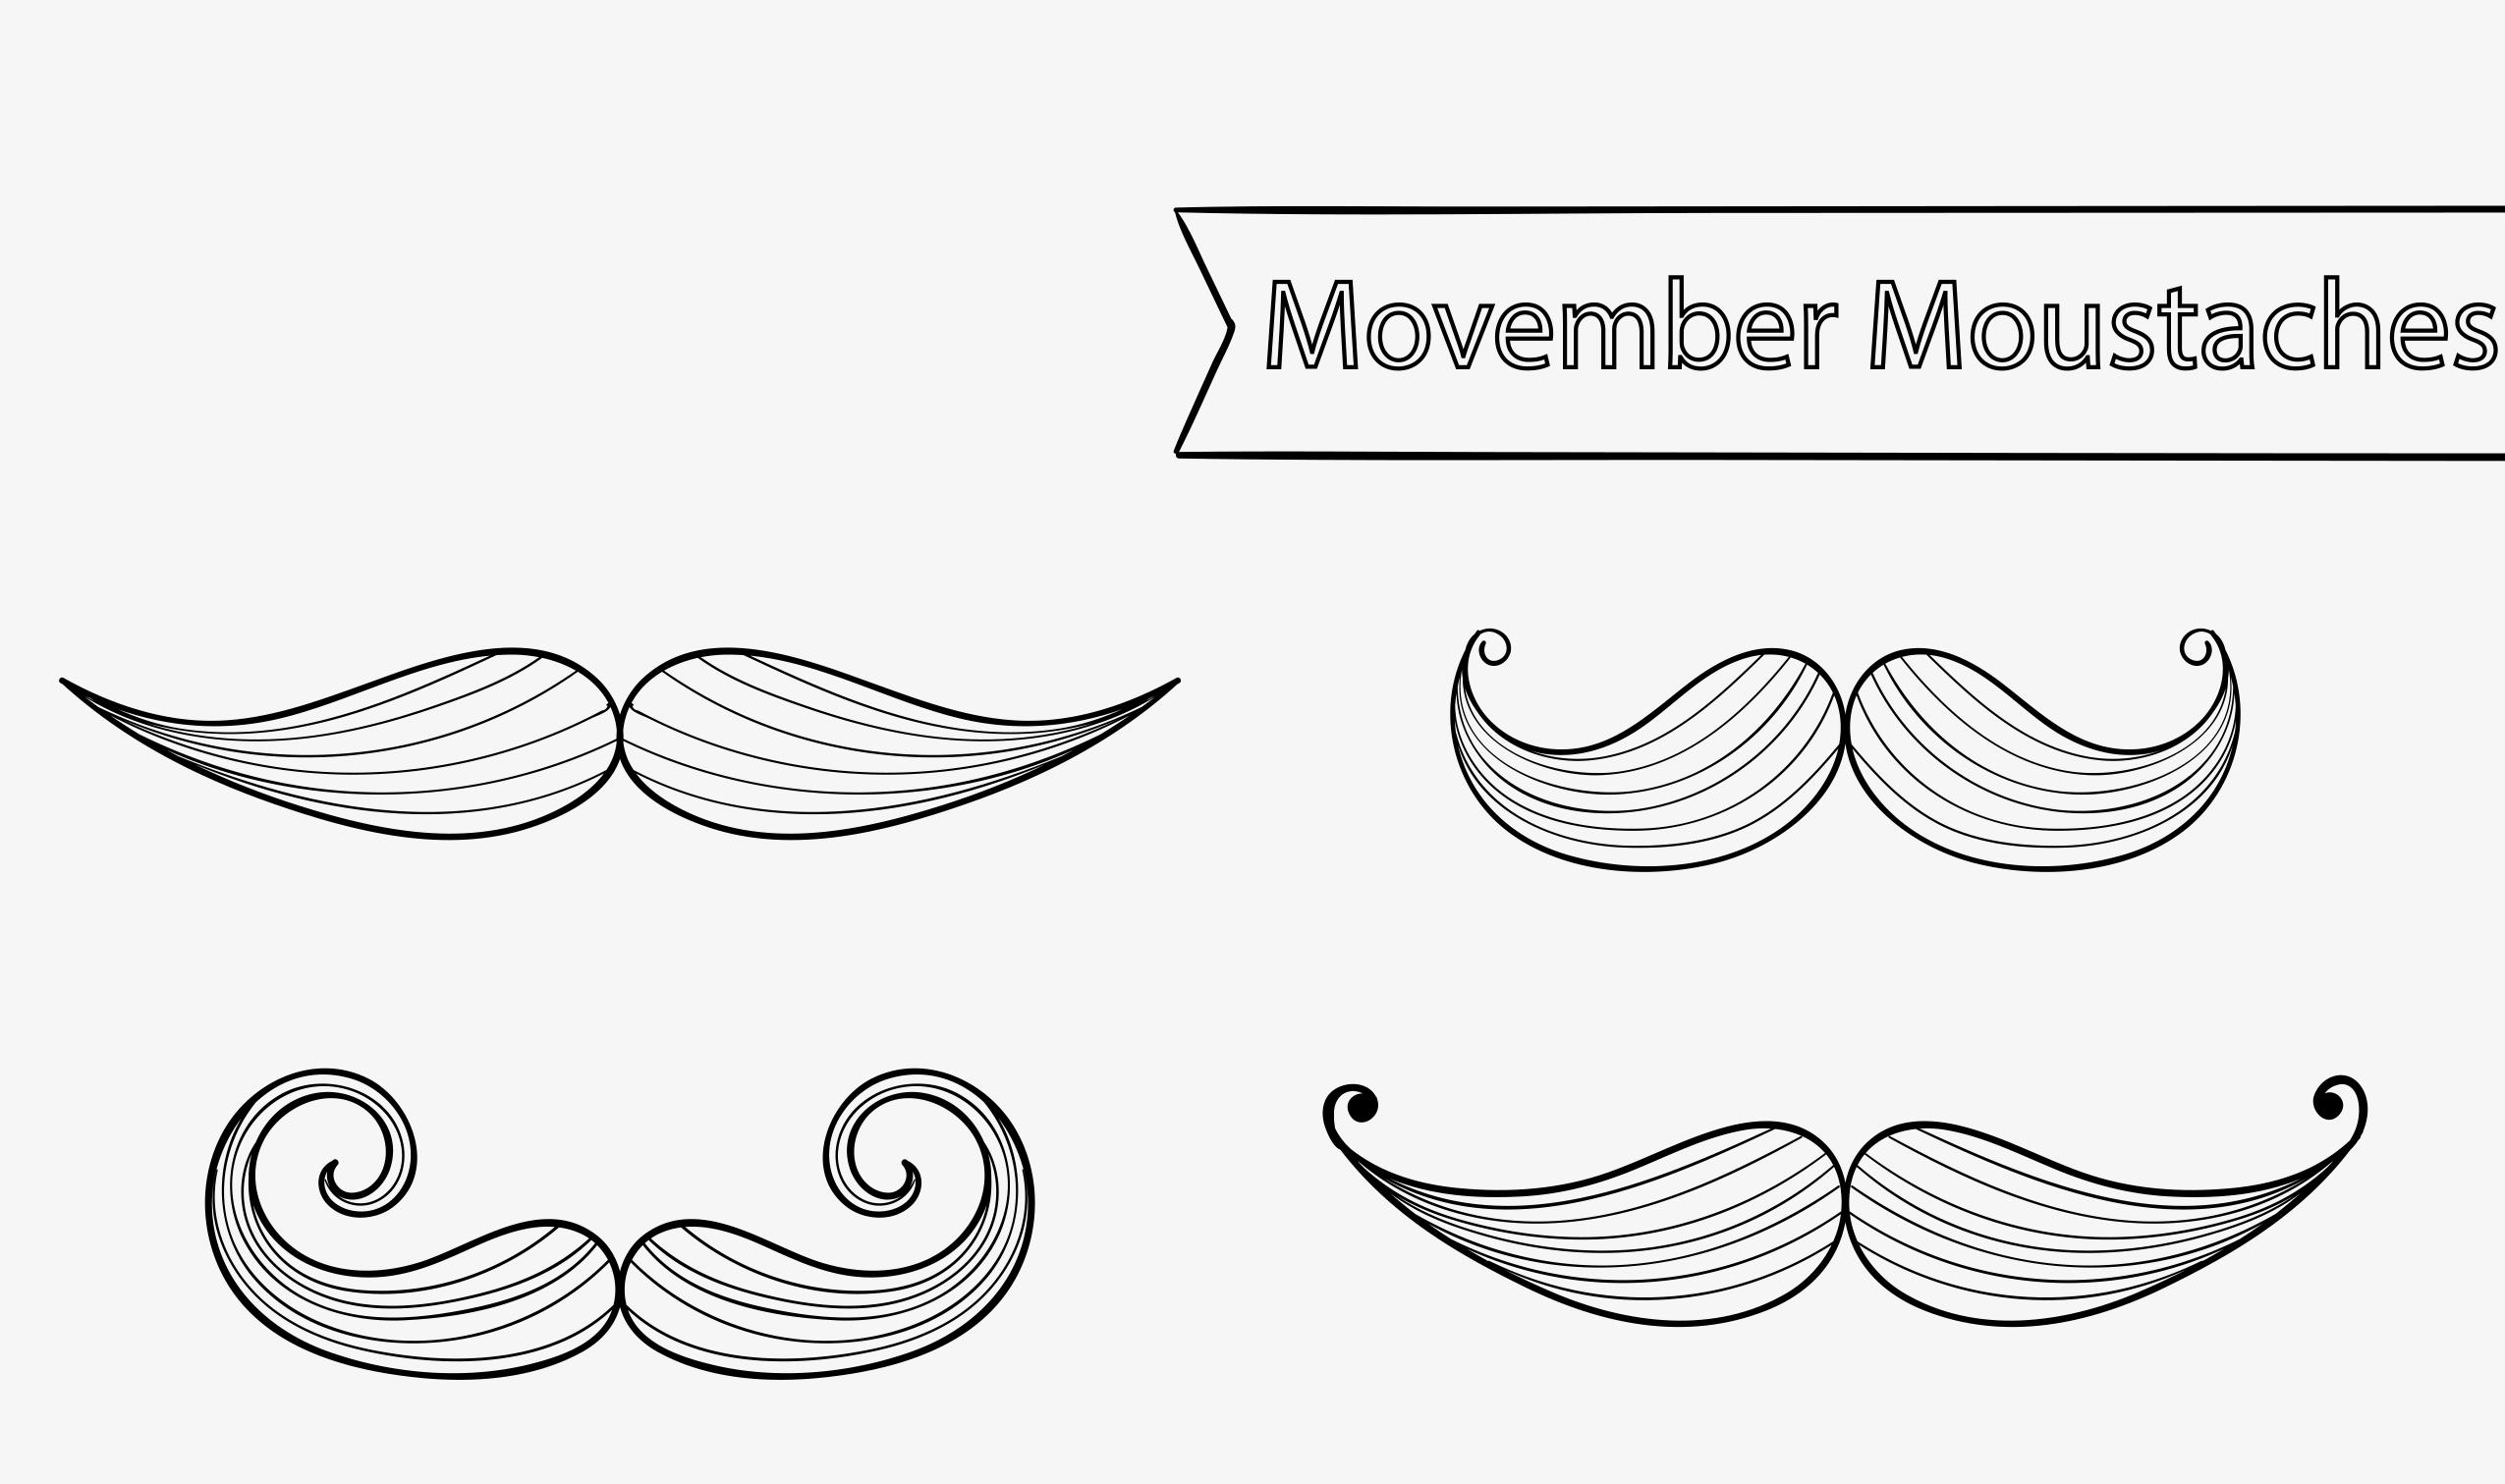 Moustache movember canada en novembre - Dessin de moustache ...